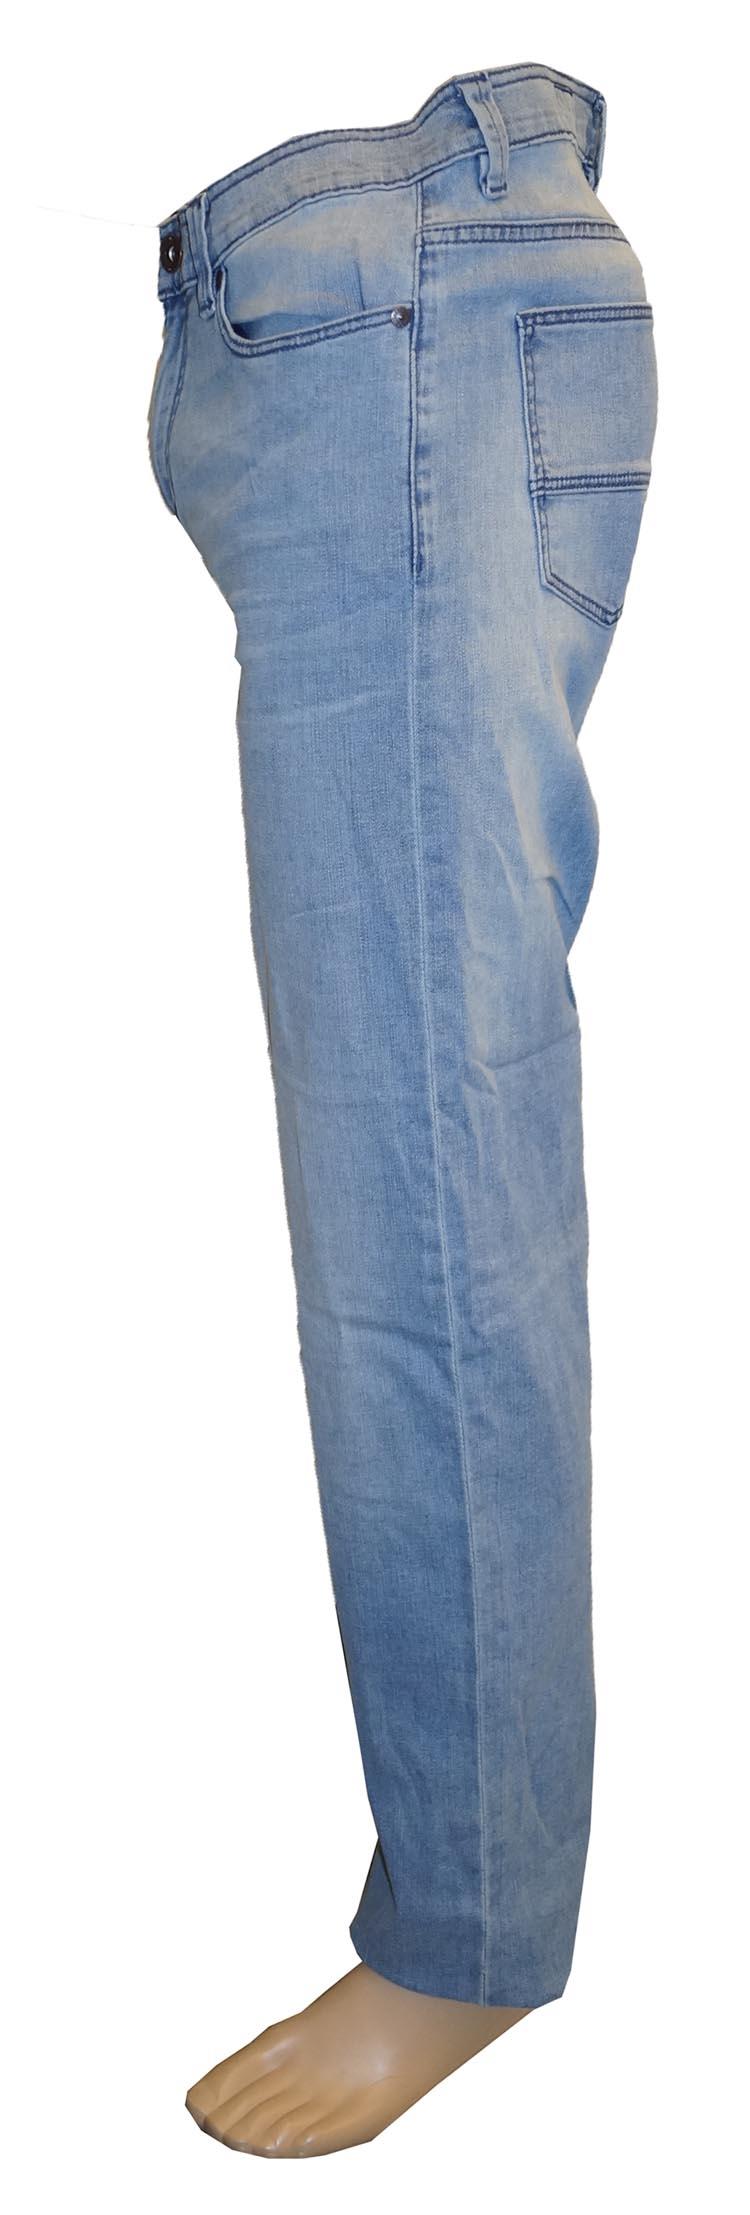 "Paddocks stretch jeans  "" Jason "" Bleach used"